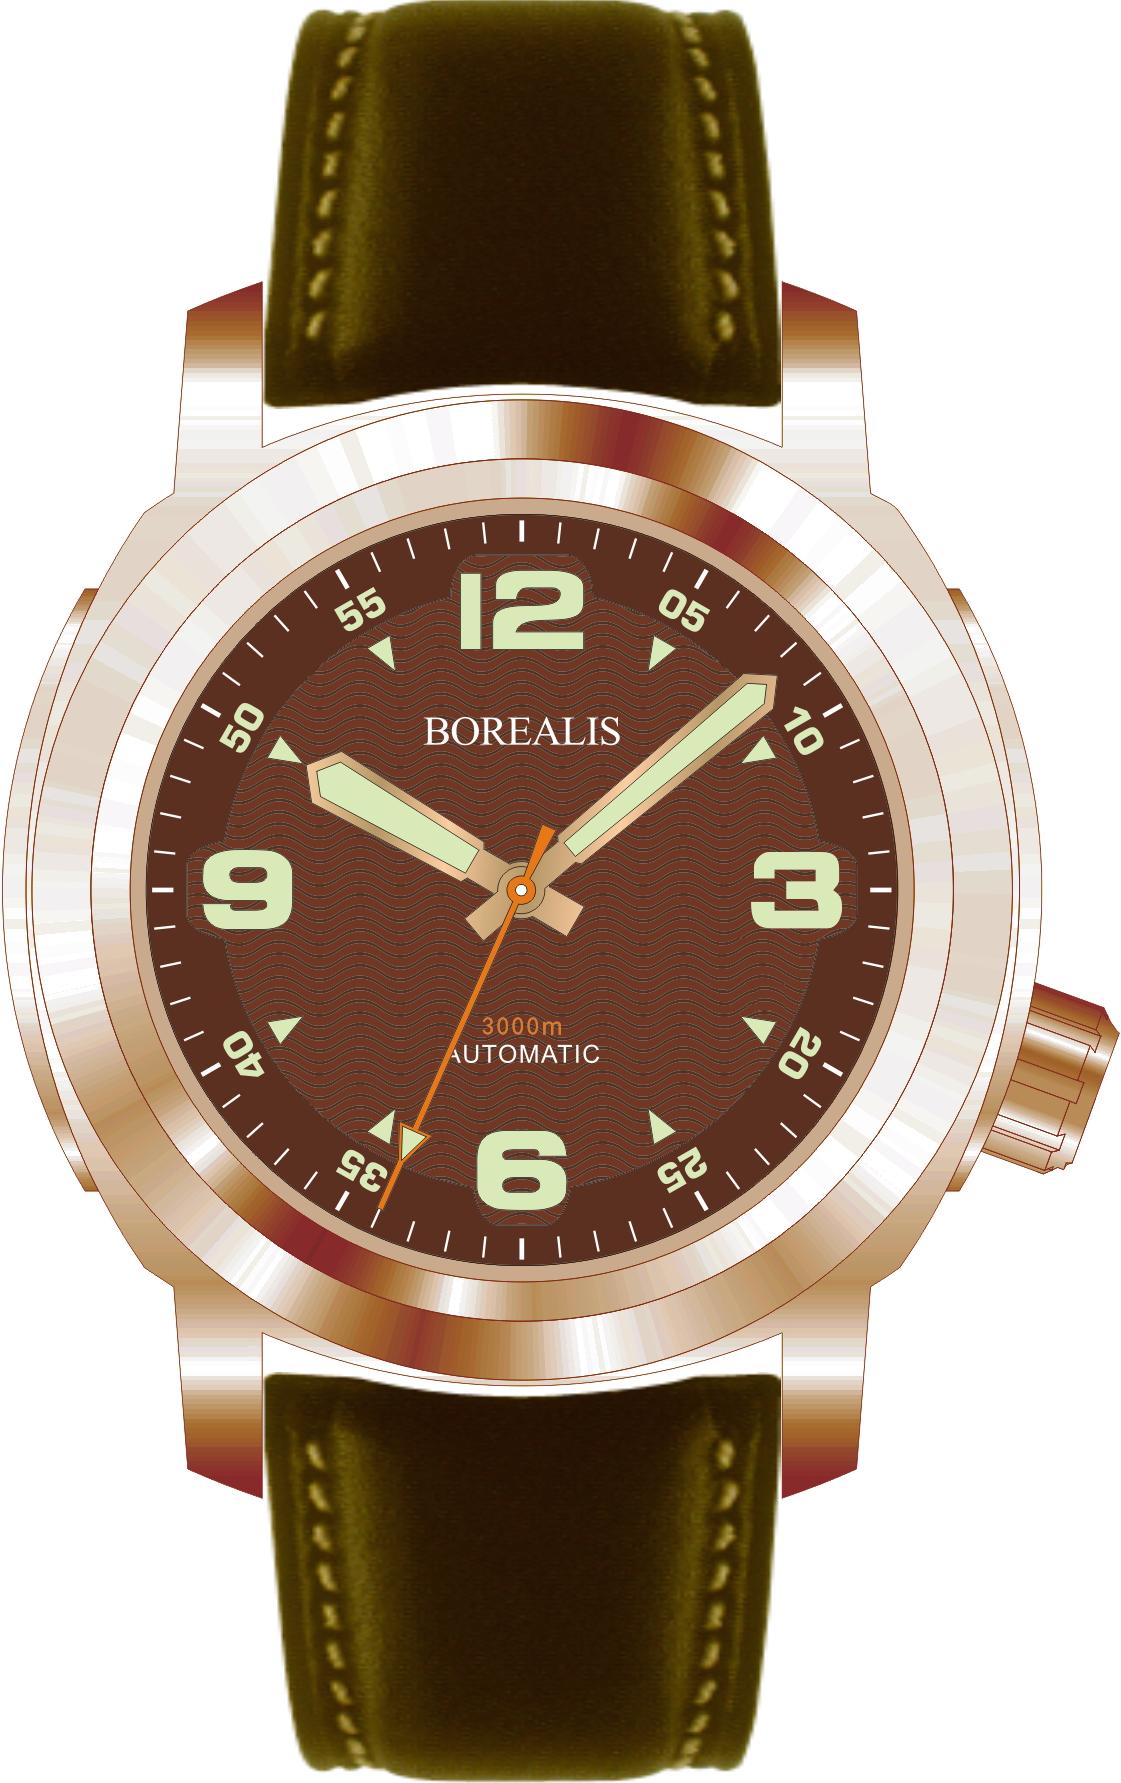 Borealis Batial Bronze CuSn8 Brown 3000m Miyota 9015 Automatic Diver Watch No Date Display BBCUSN8BROWNNODATE